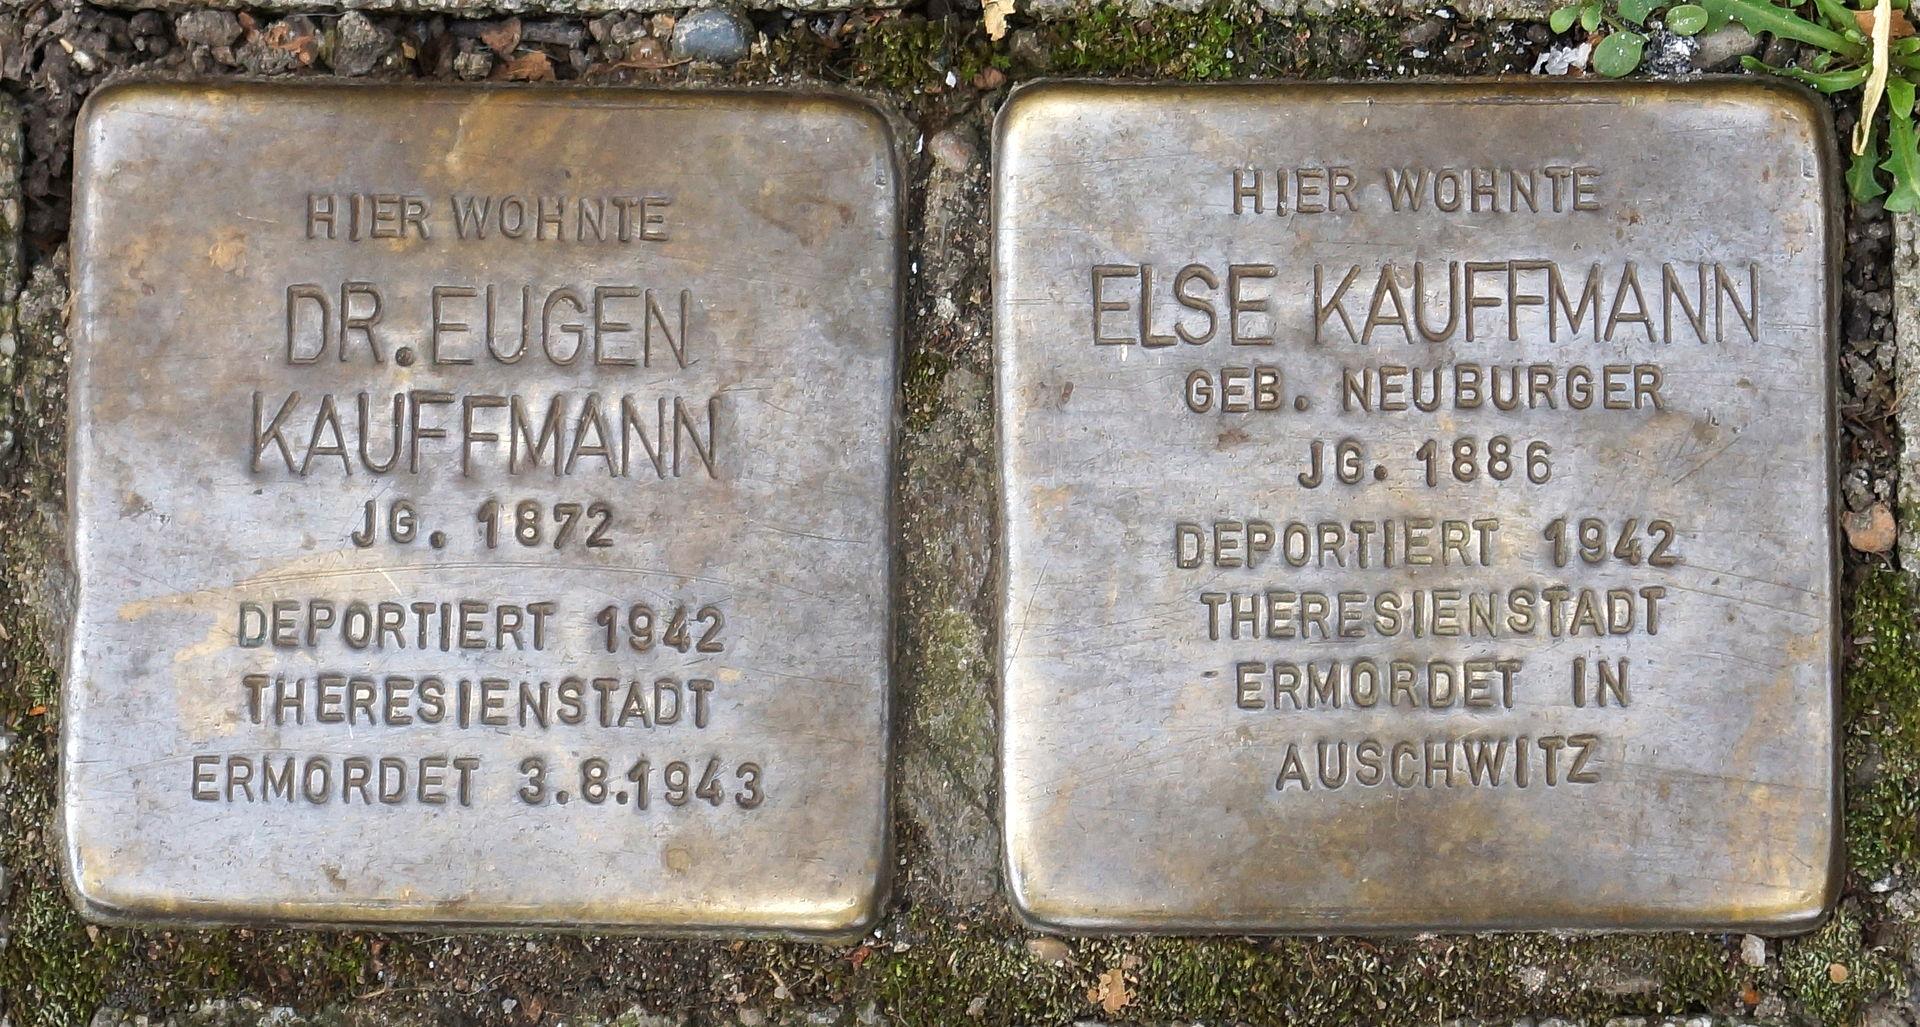 Stolpersteine - Stuttgart - Daimlerstraße 44 - Dr. Eugen, Else Kauffmann.JPG